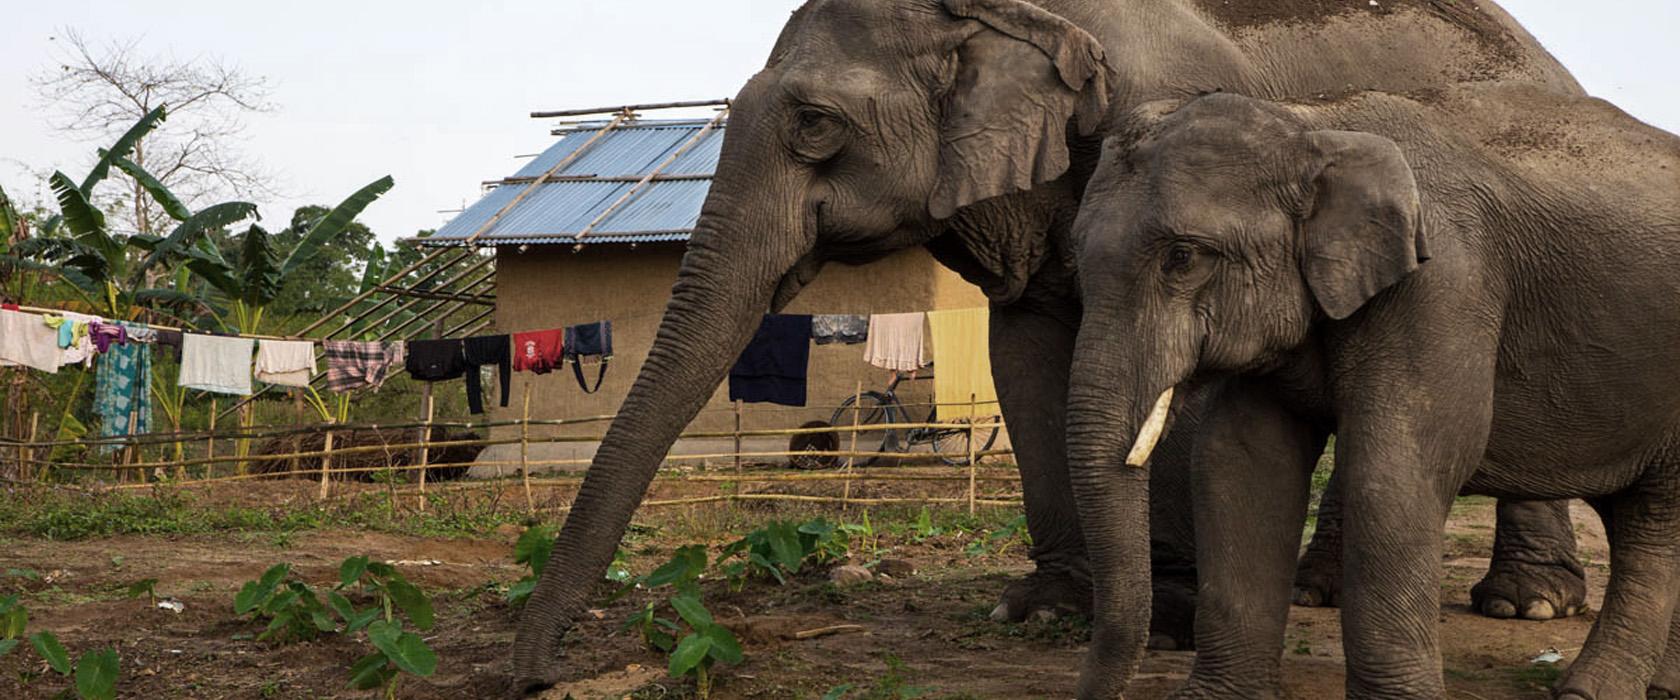 elephants-raiding-field